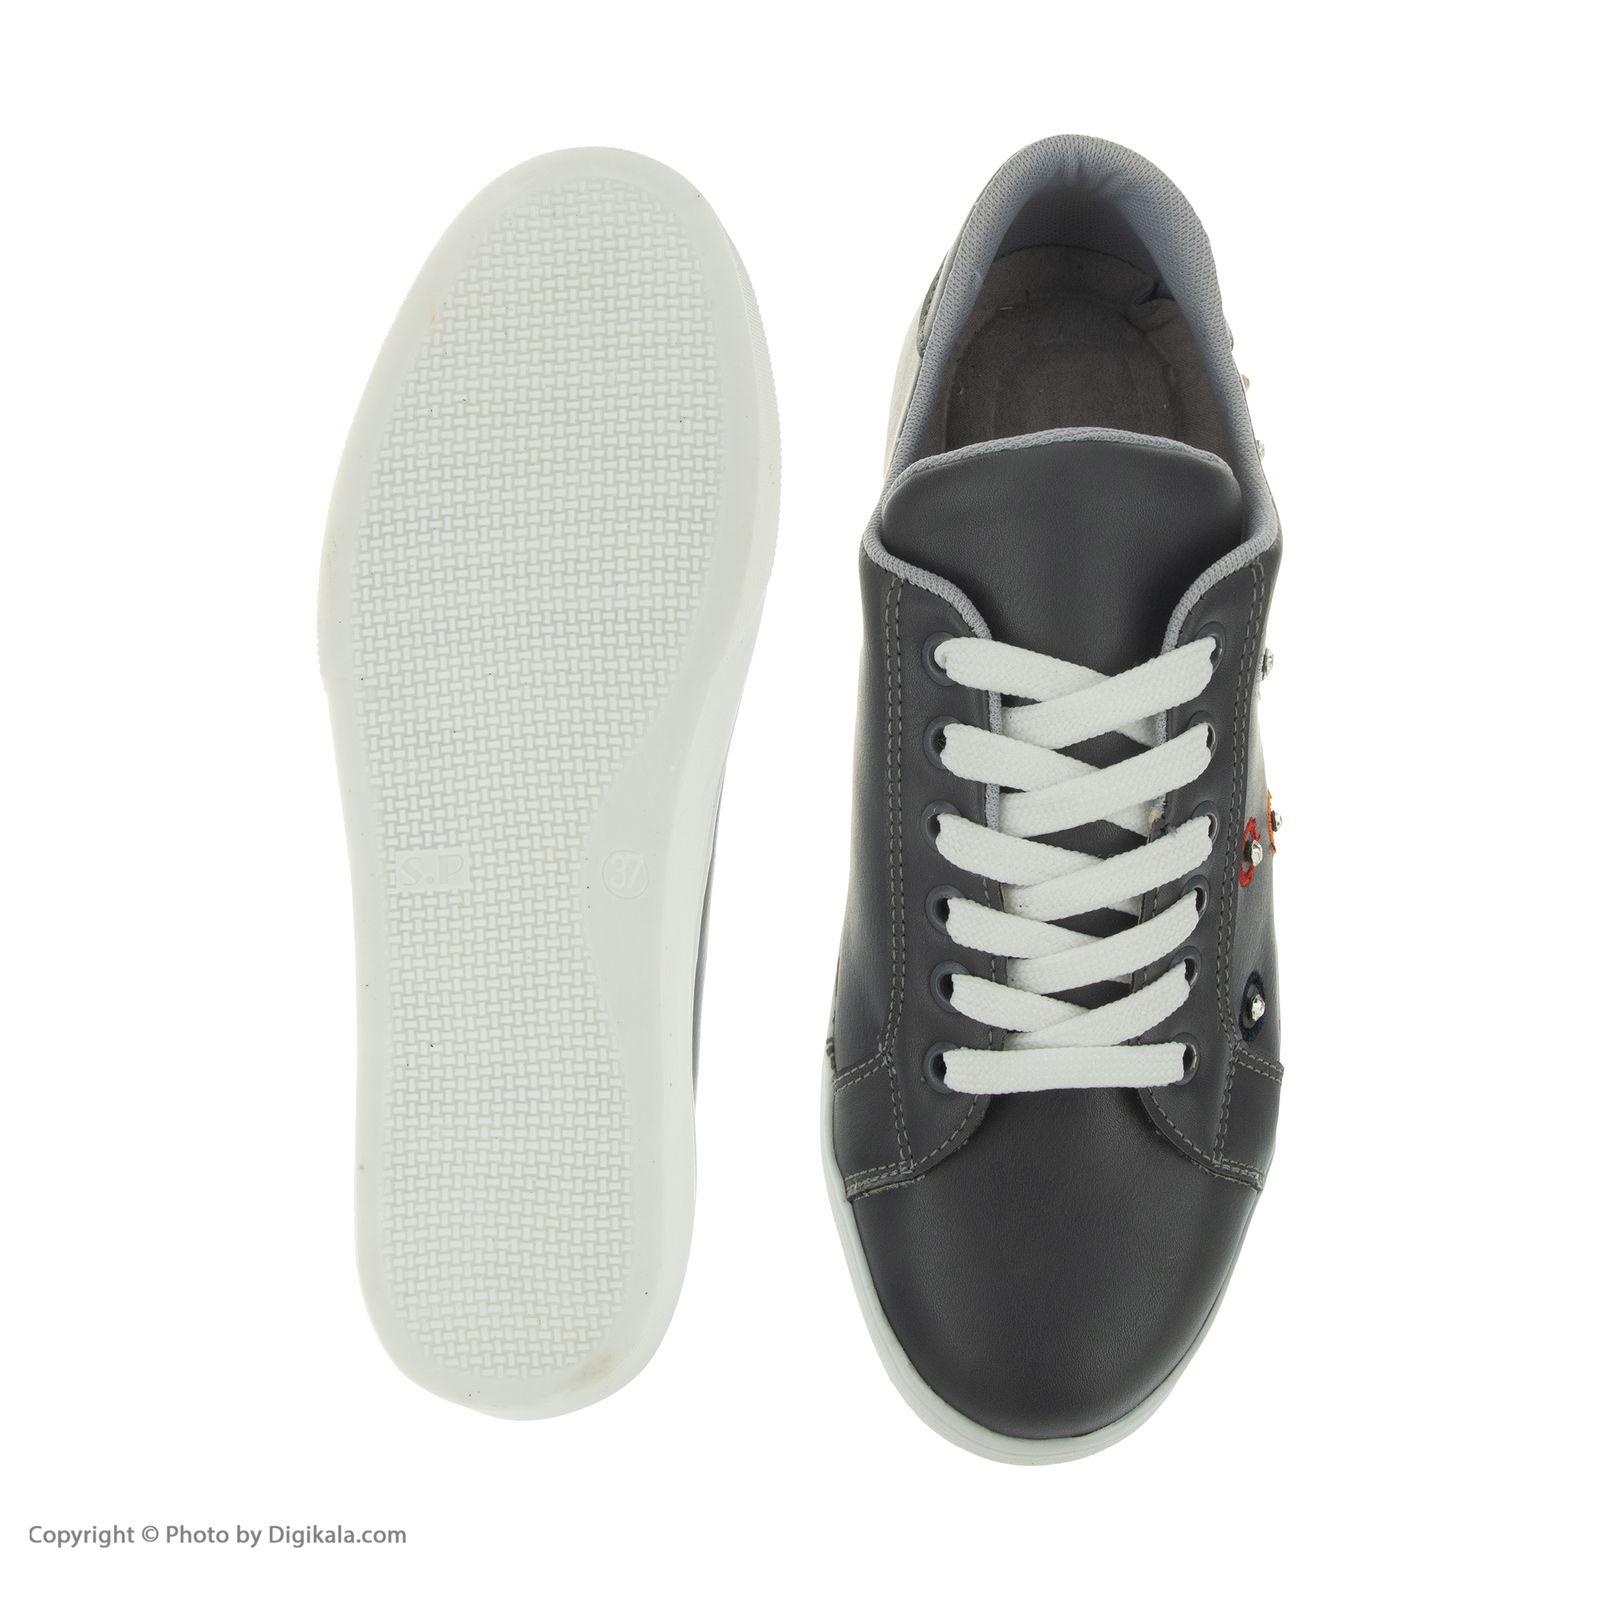 کفش روزمره زنانه مدل 4013 -  - 6